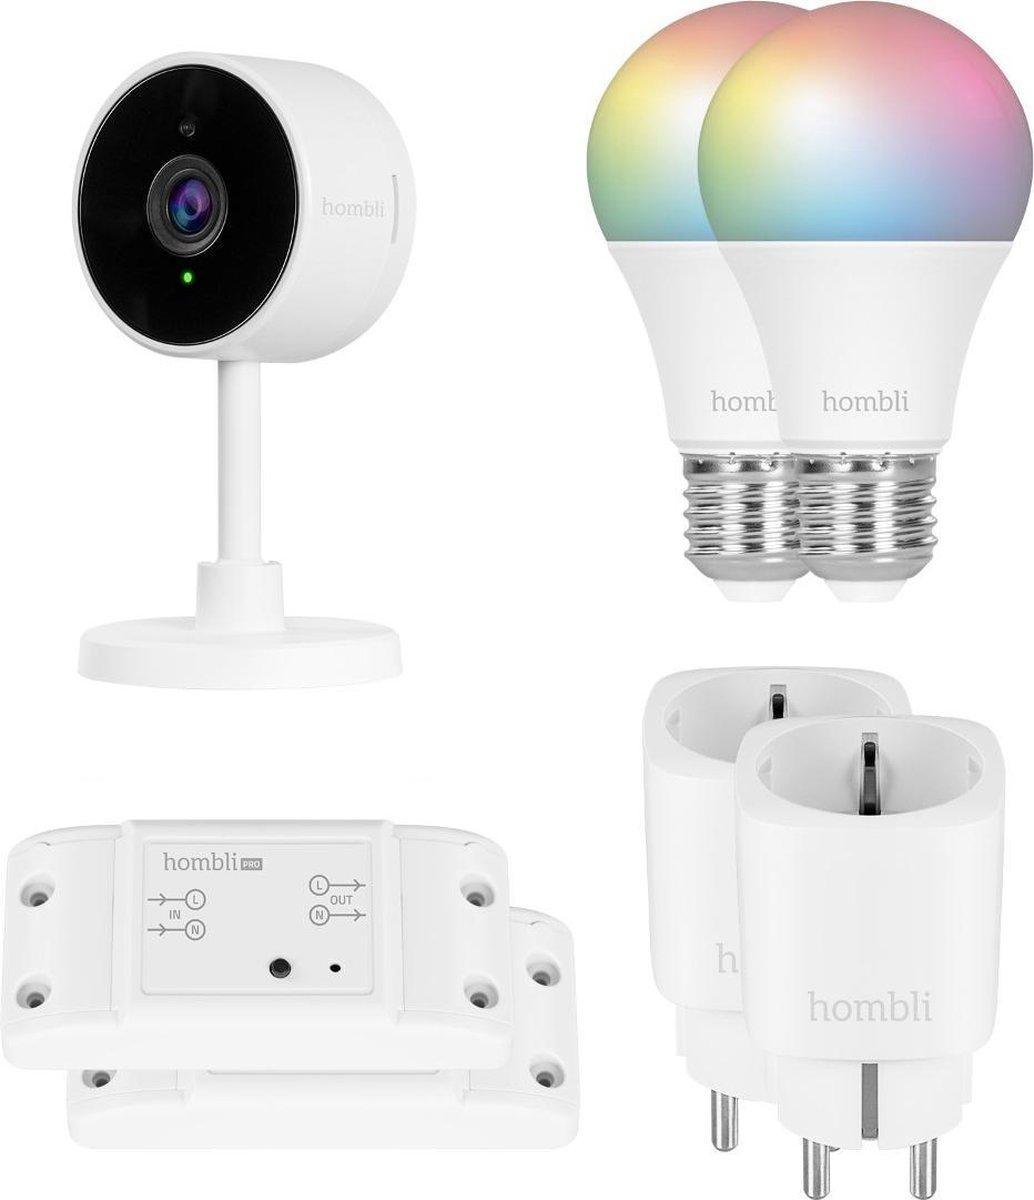 Hombli Starterkit - 2 Smart Lampen Wit & Gekleurd Licht + Slimme Camera + 2 Wifi Schakelaars + 2 Slimme Stekkers